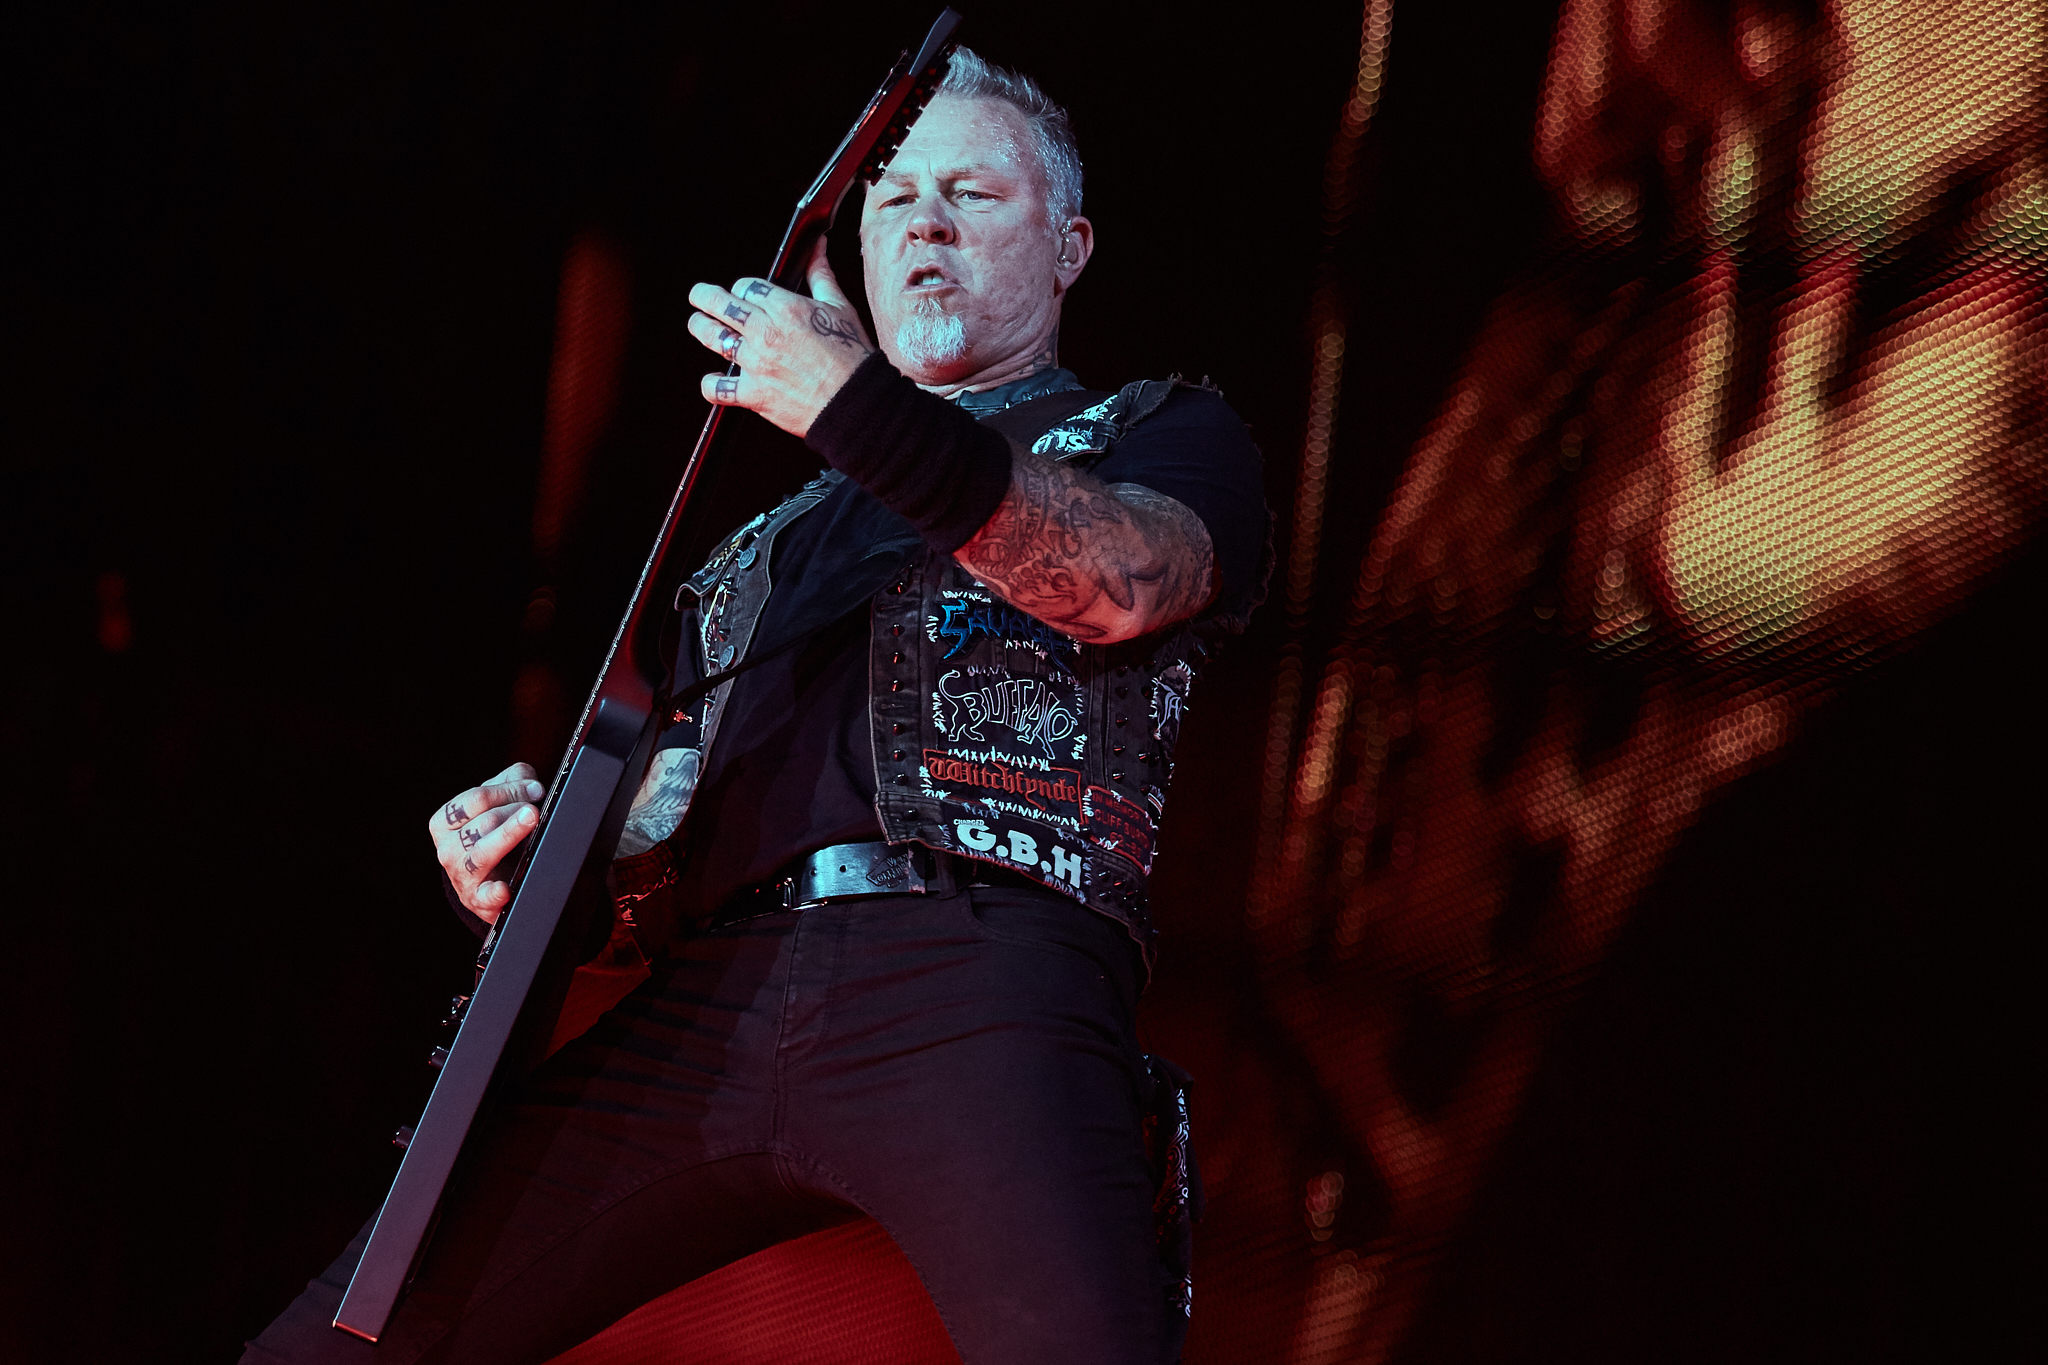 Metallica_at_US_Bank_Stadium_Minneapolis_First_Rock_Show_08-20_2016_Photo_By_Joe_Lemke_021.jpg